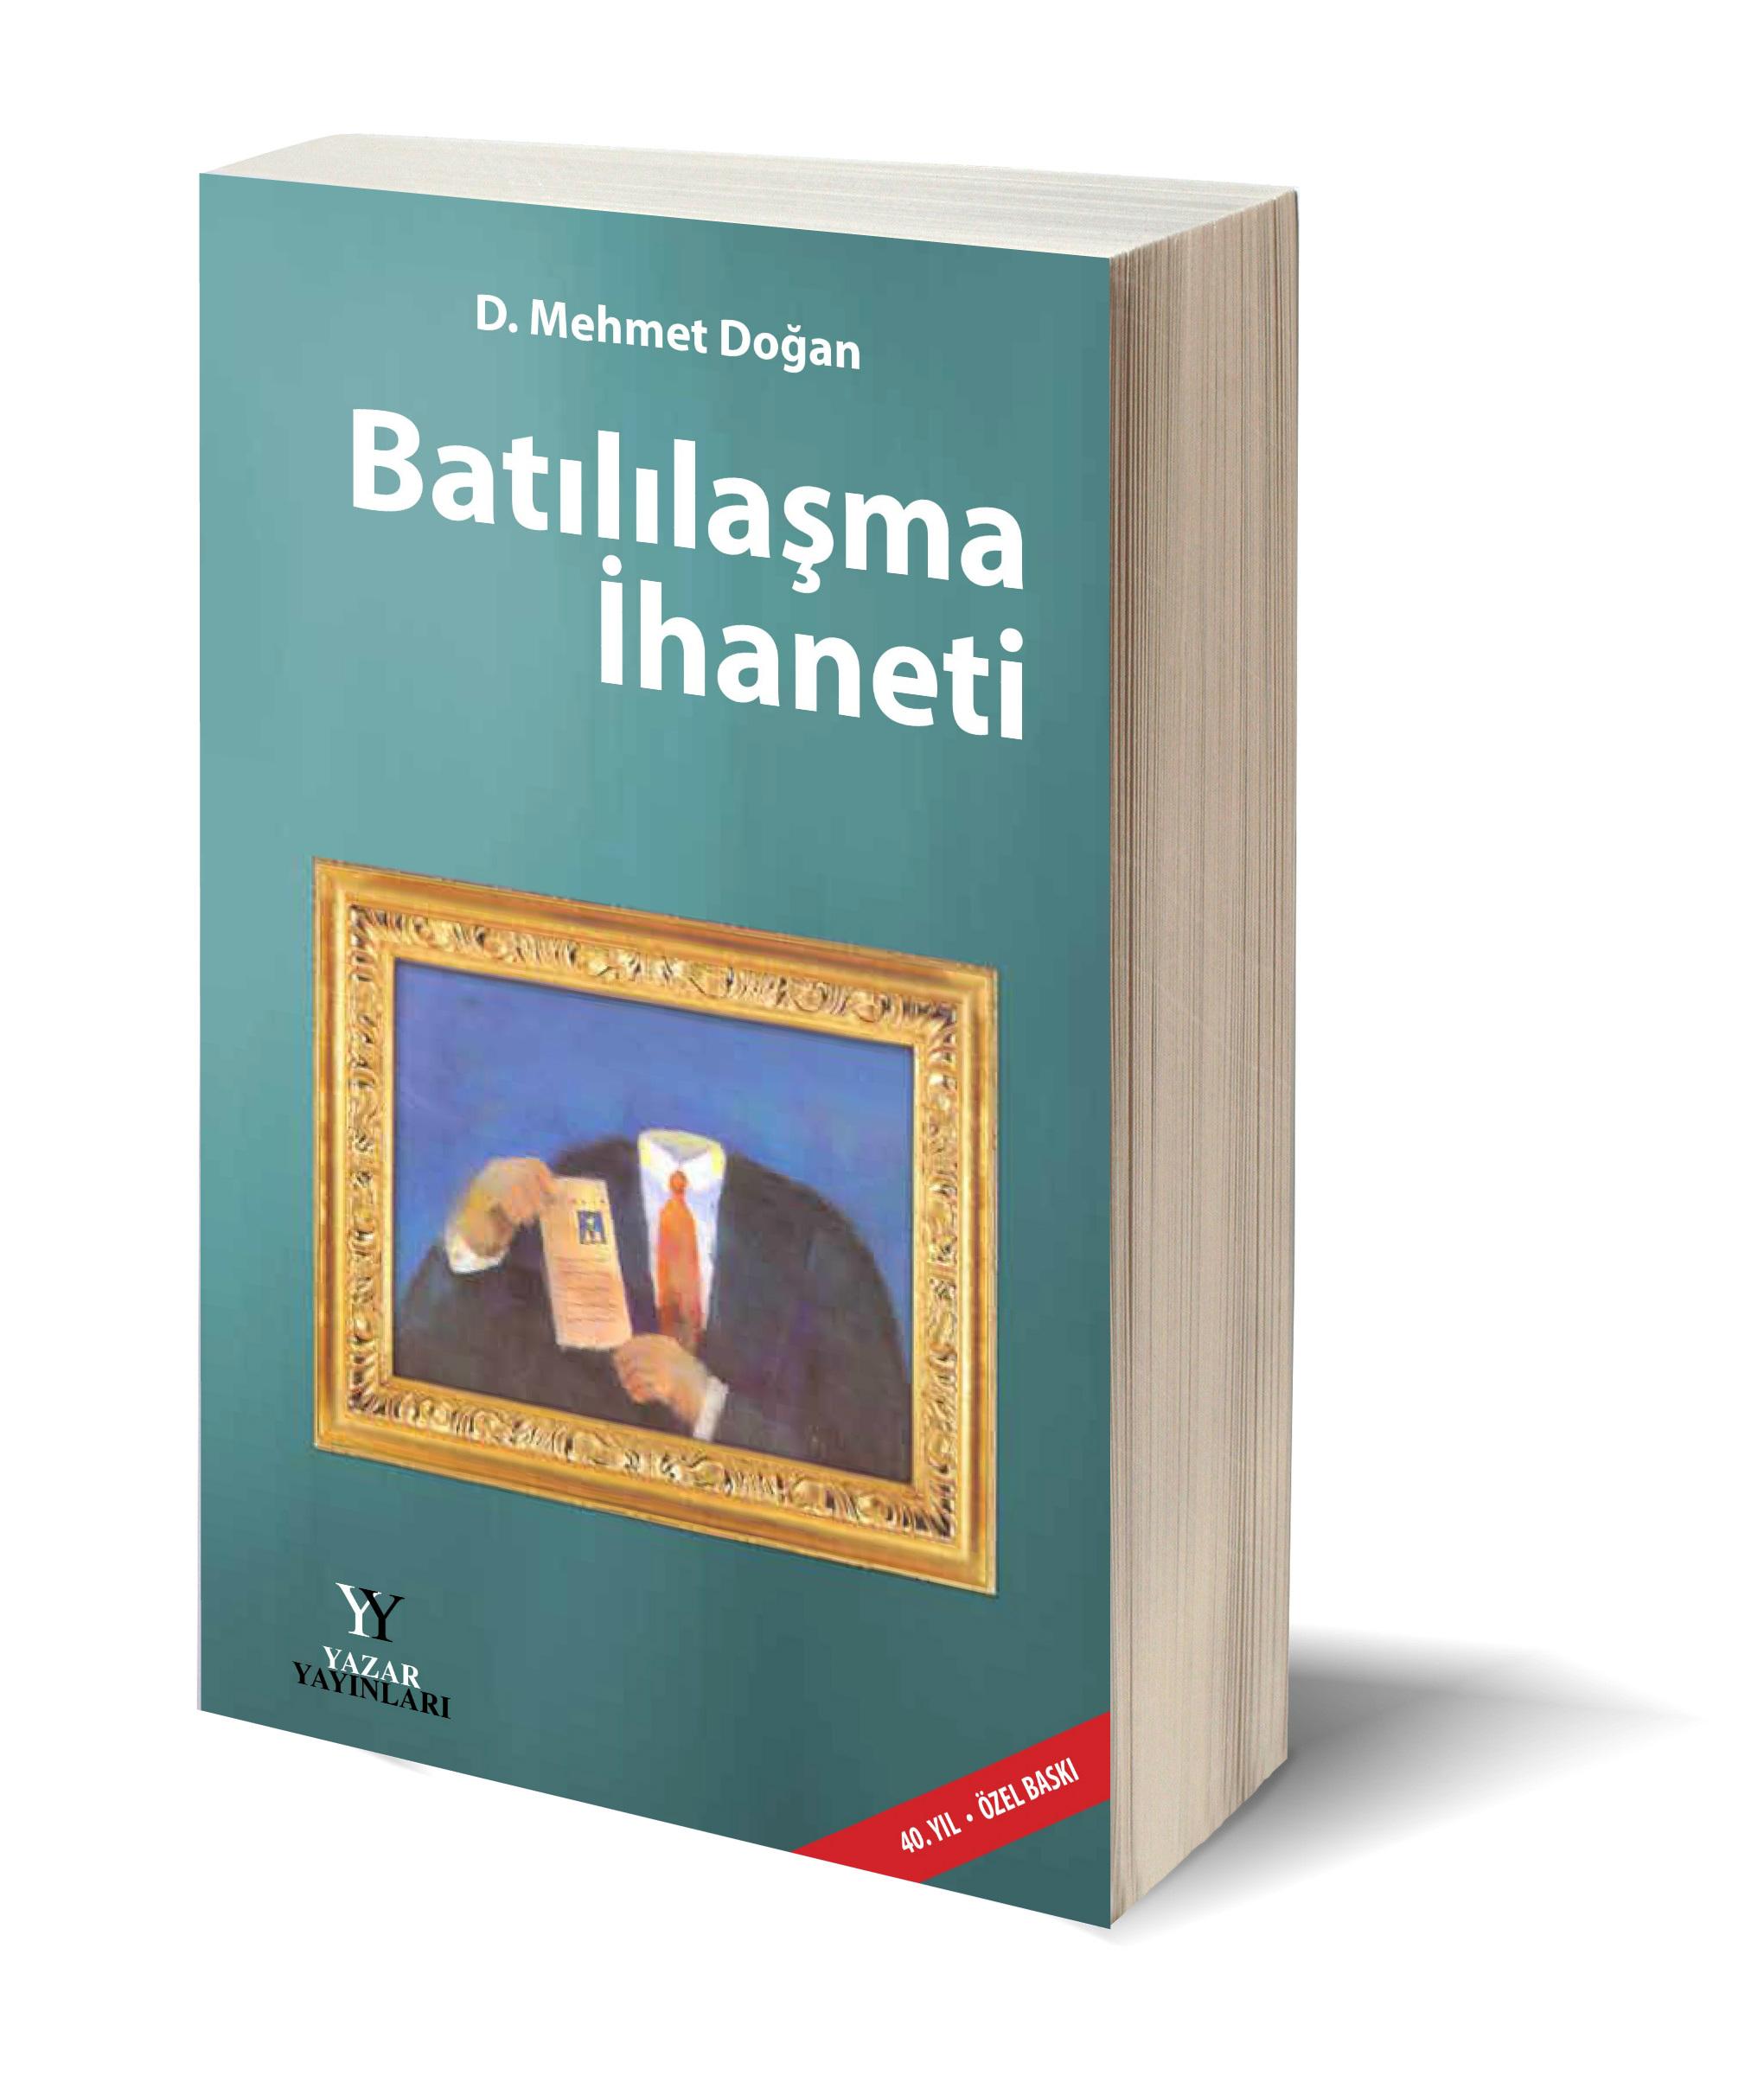 batililasma3d.jpg